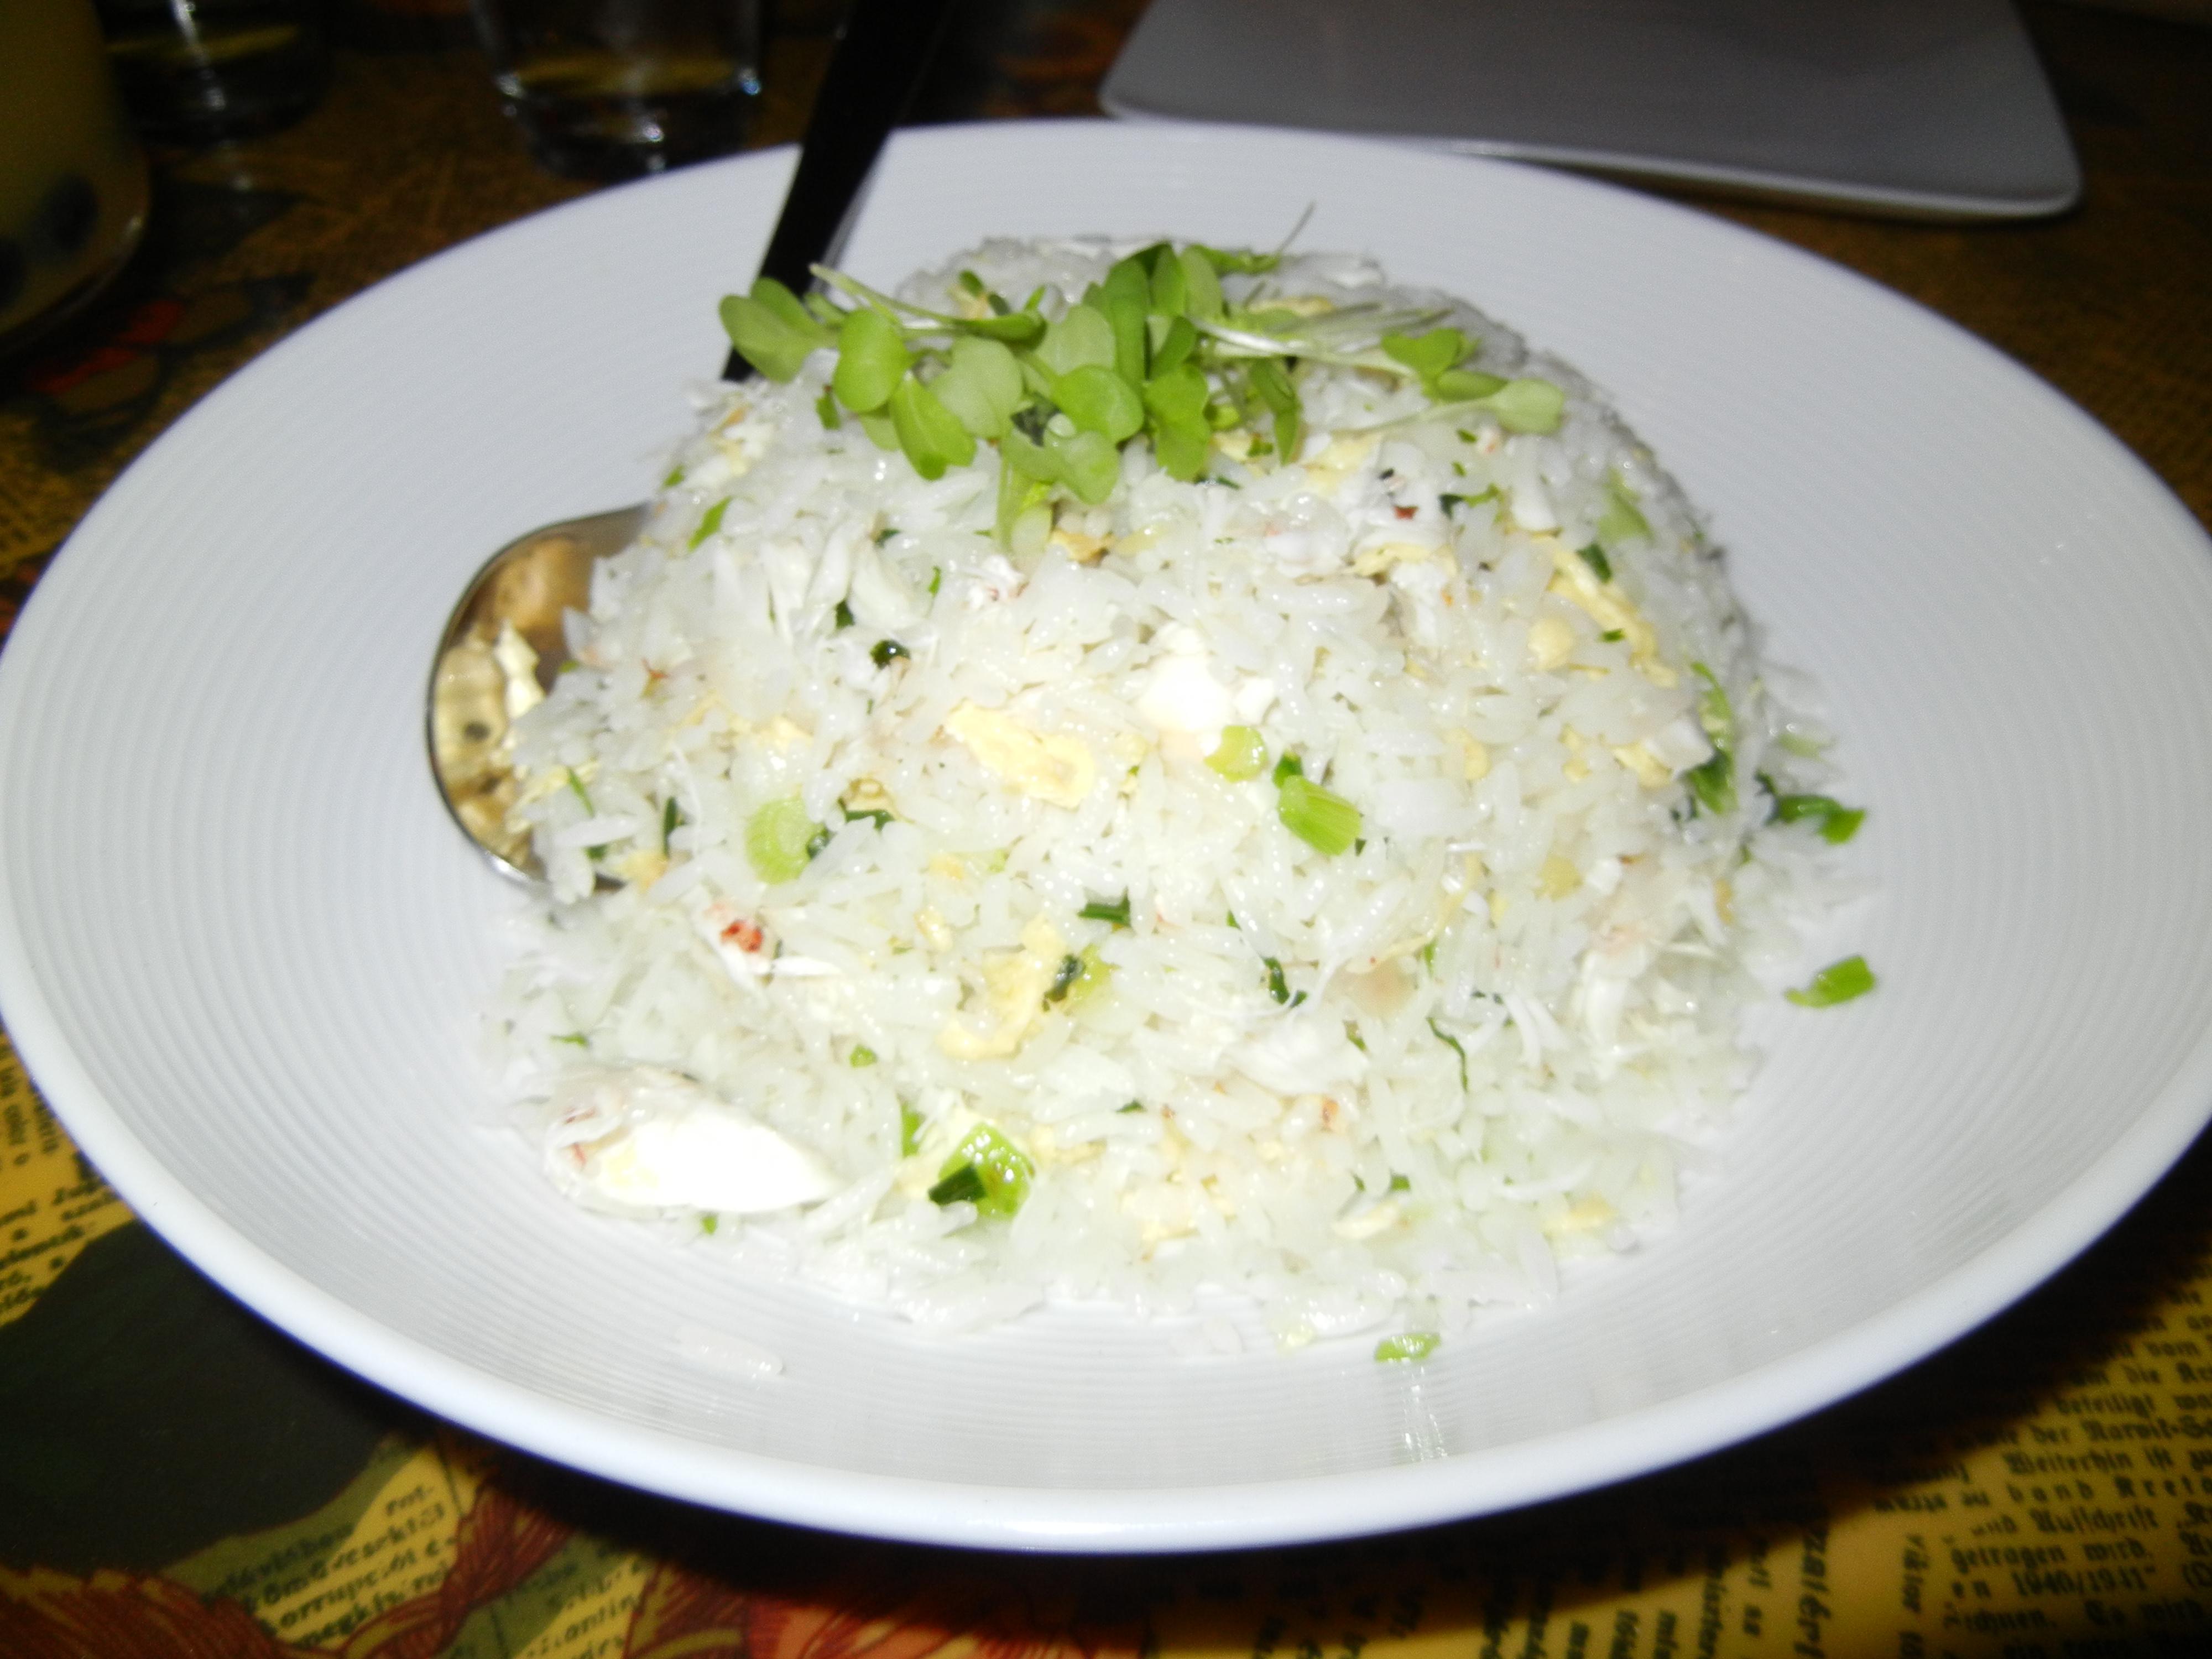 Restaurant Review – Buddakan (Atlantic City, NJ) | Niran\'s Food Blog